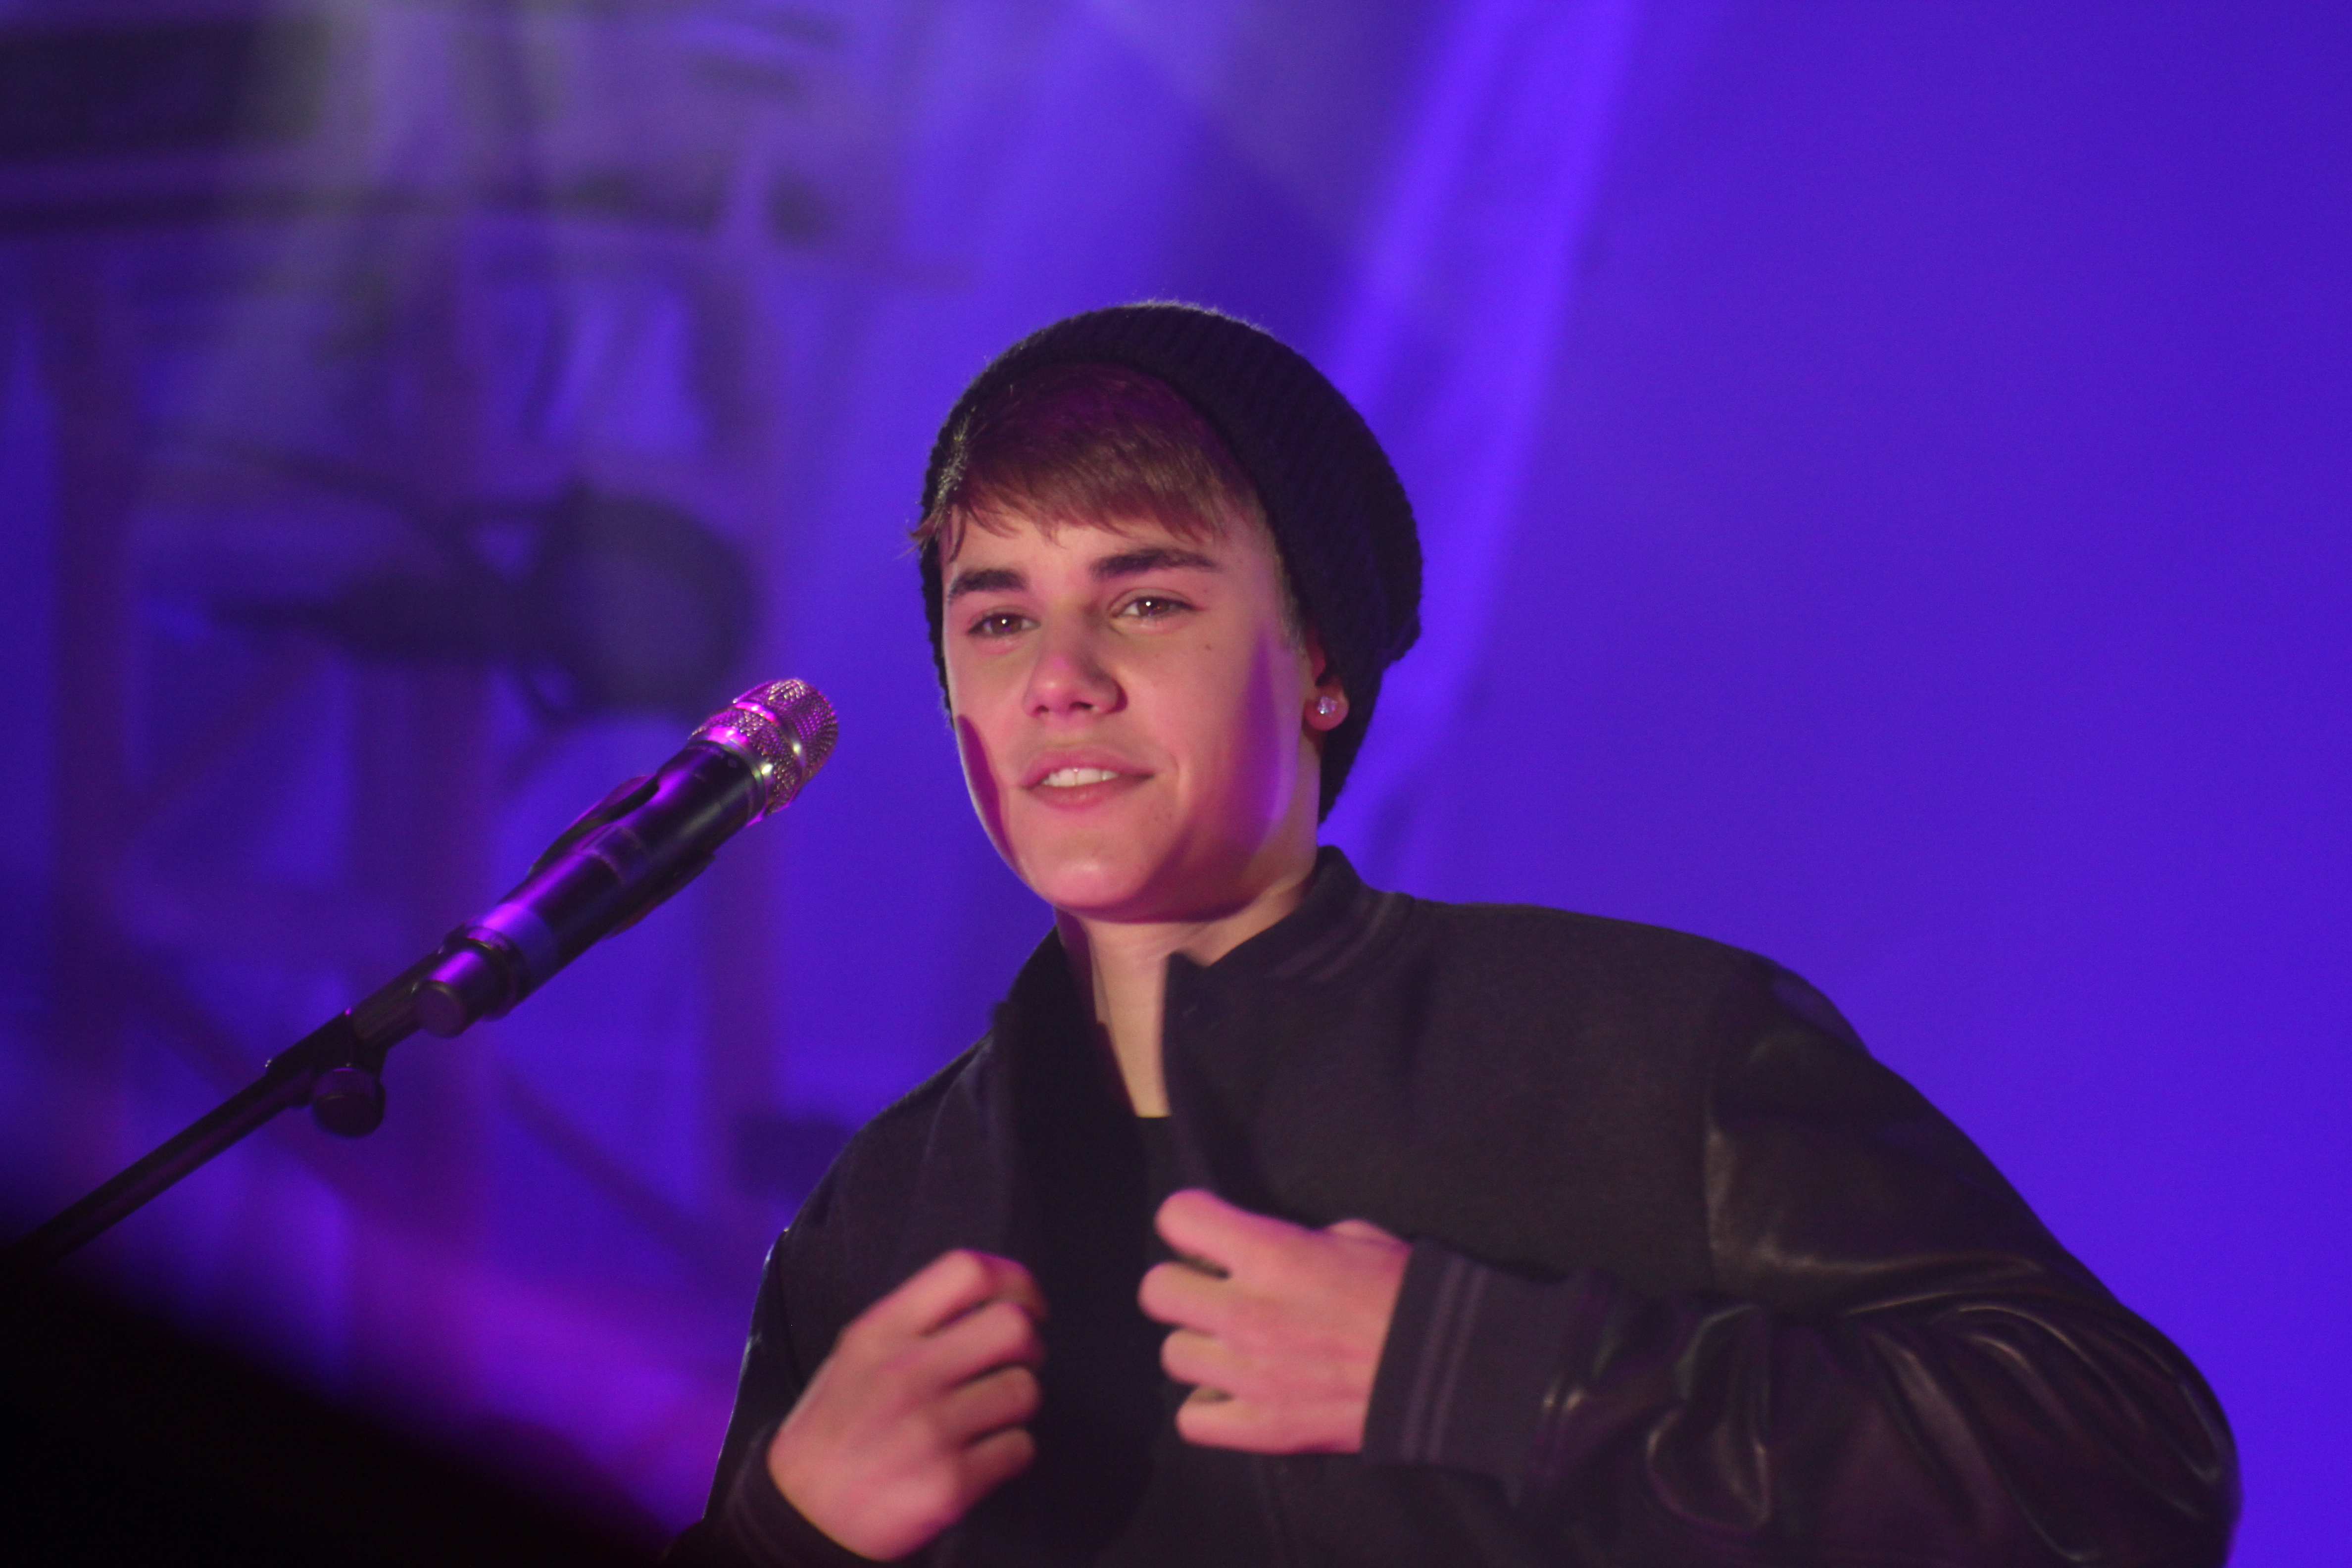 Justin Bieber in London – EK13 Photography